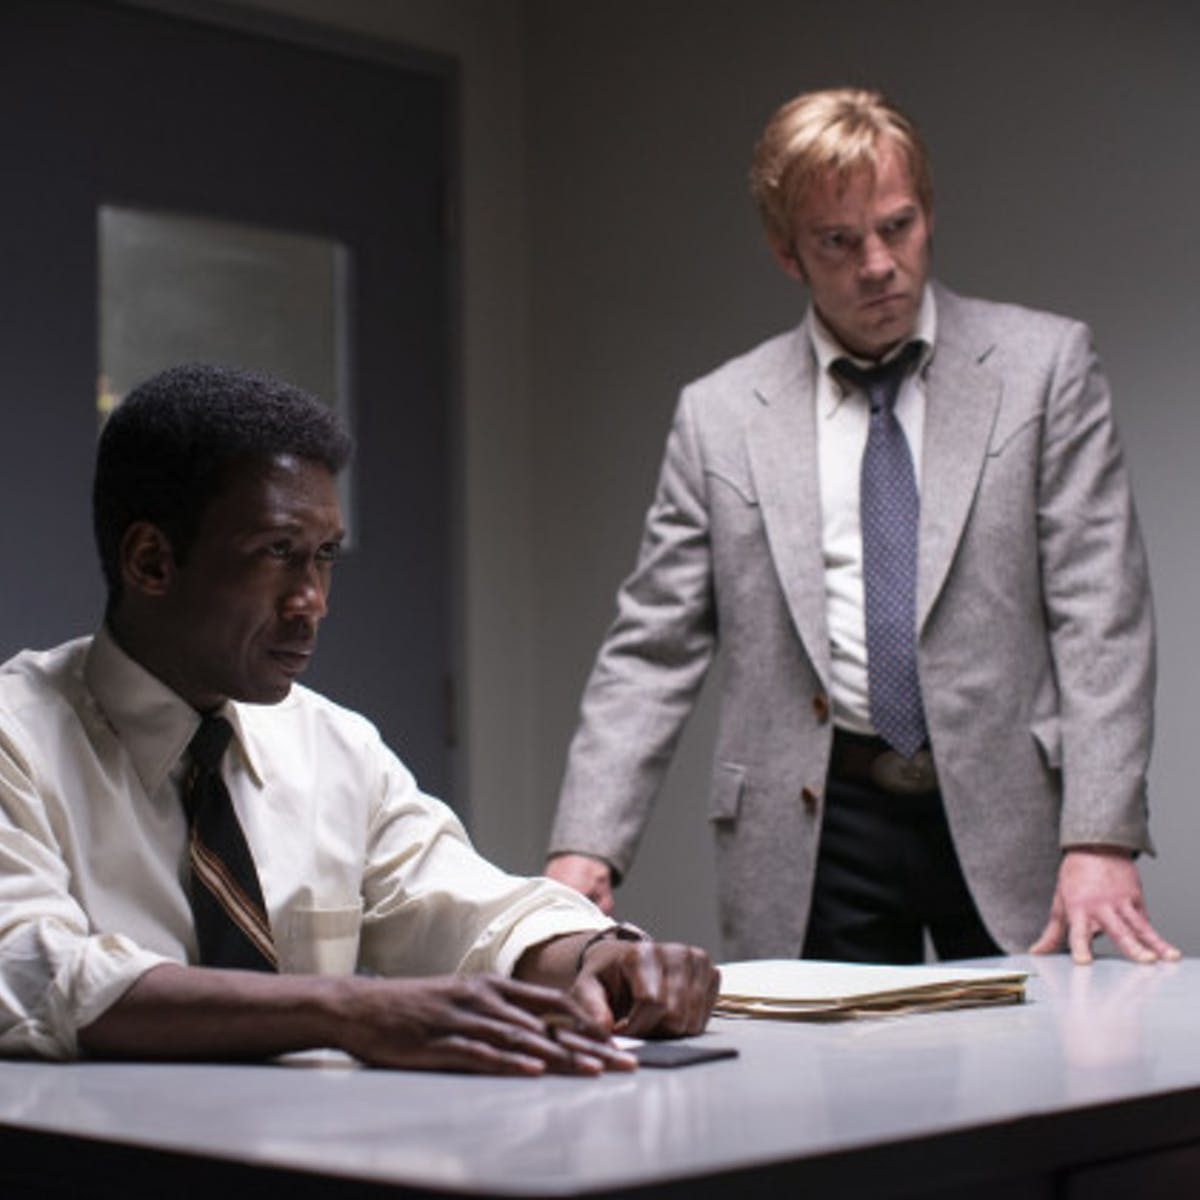 True Detective' Season 3 Release Date, Cast, Trailer